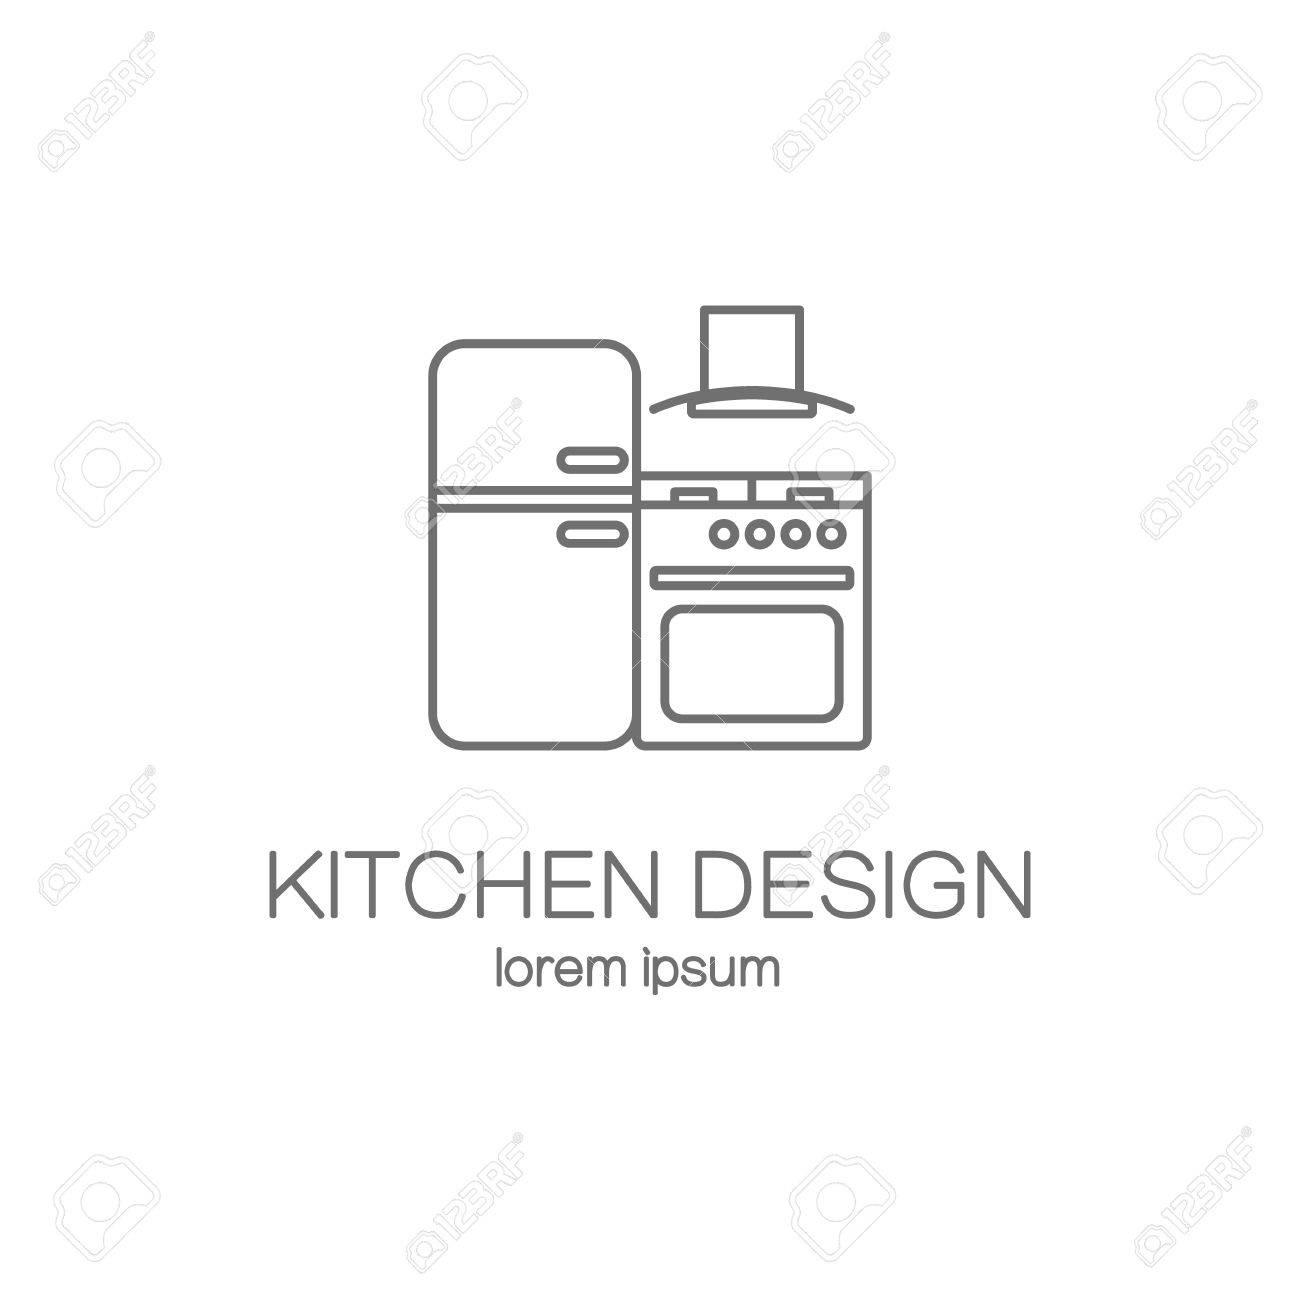 kitchen design template white chandelier line icon web logotype templates modern easy to edit logo